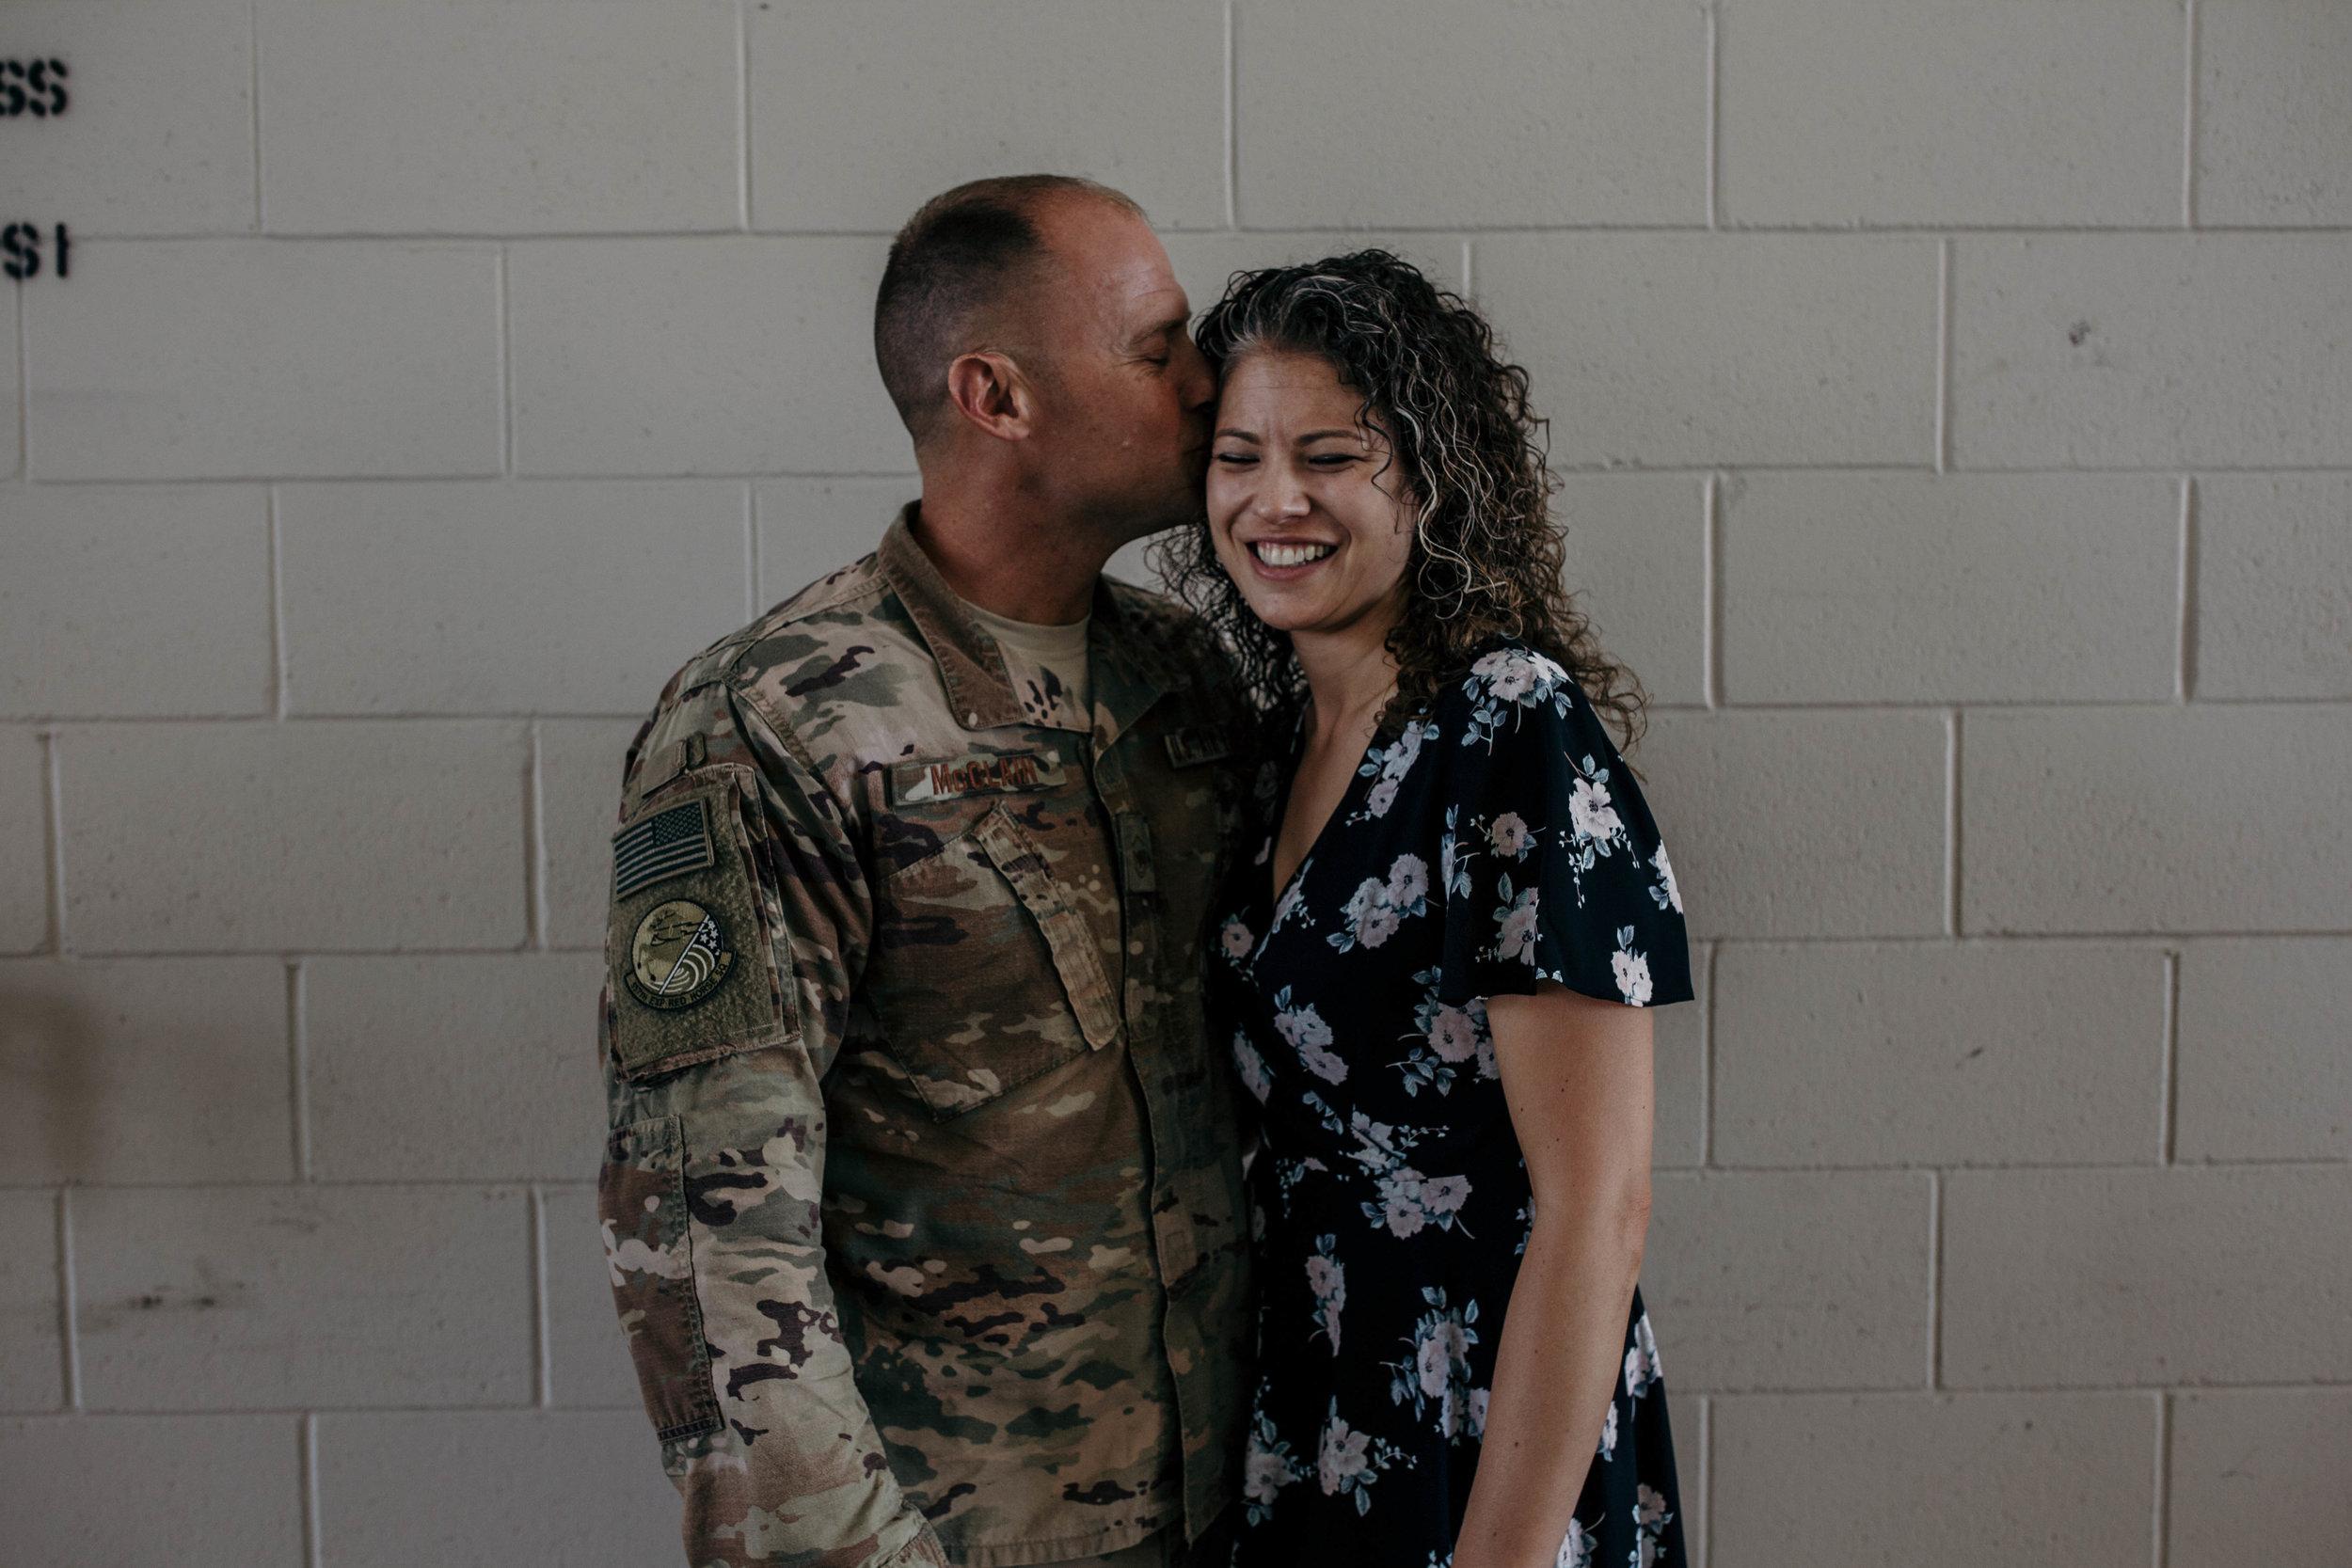 Heart felt military homecoming after a long deployment